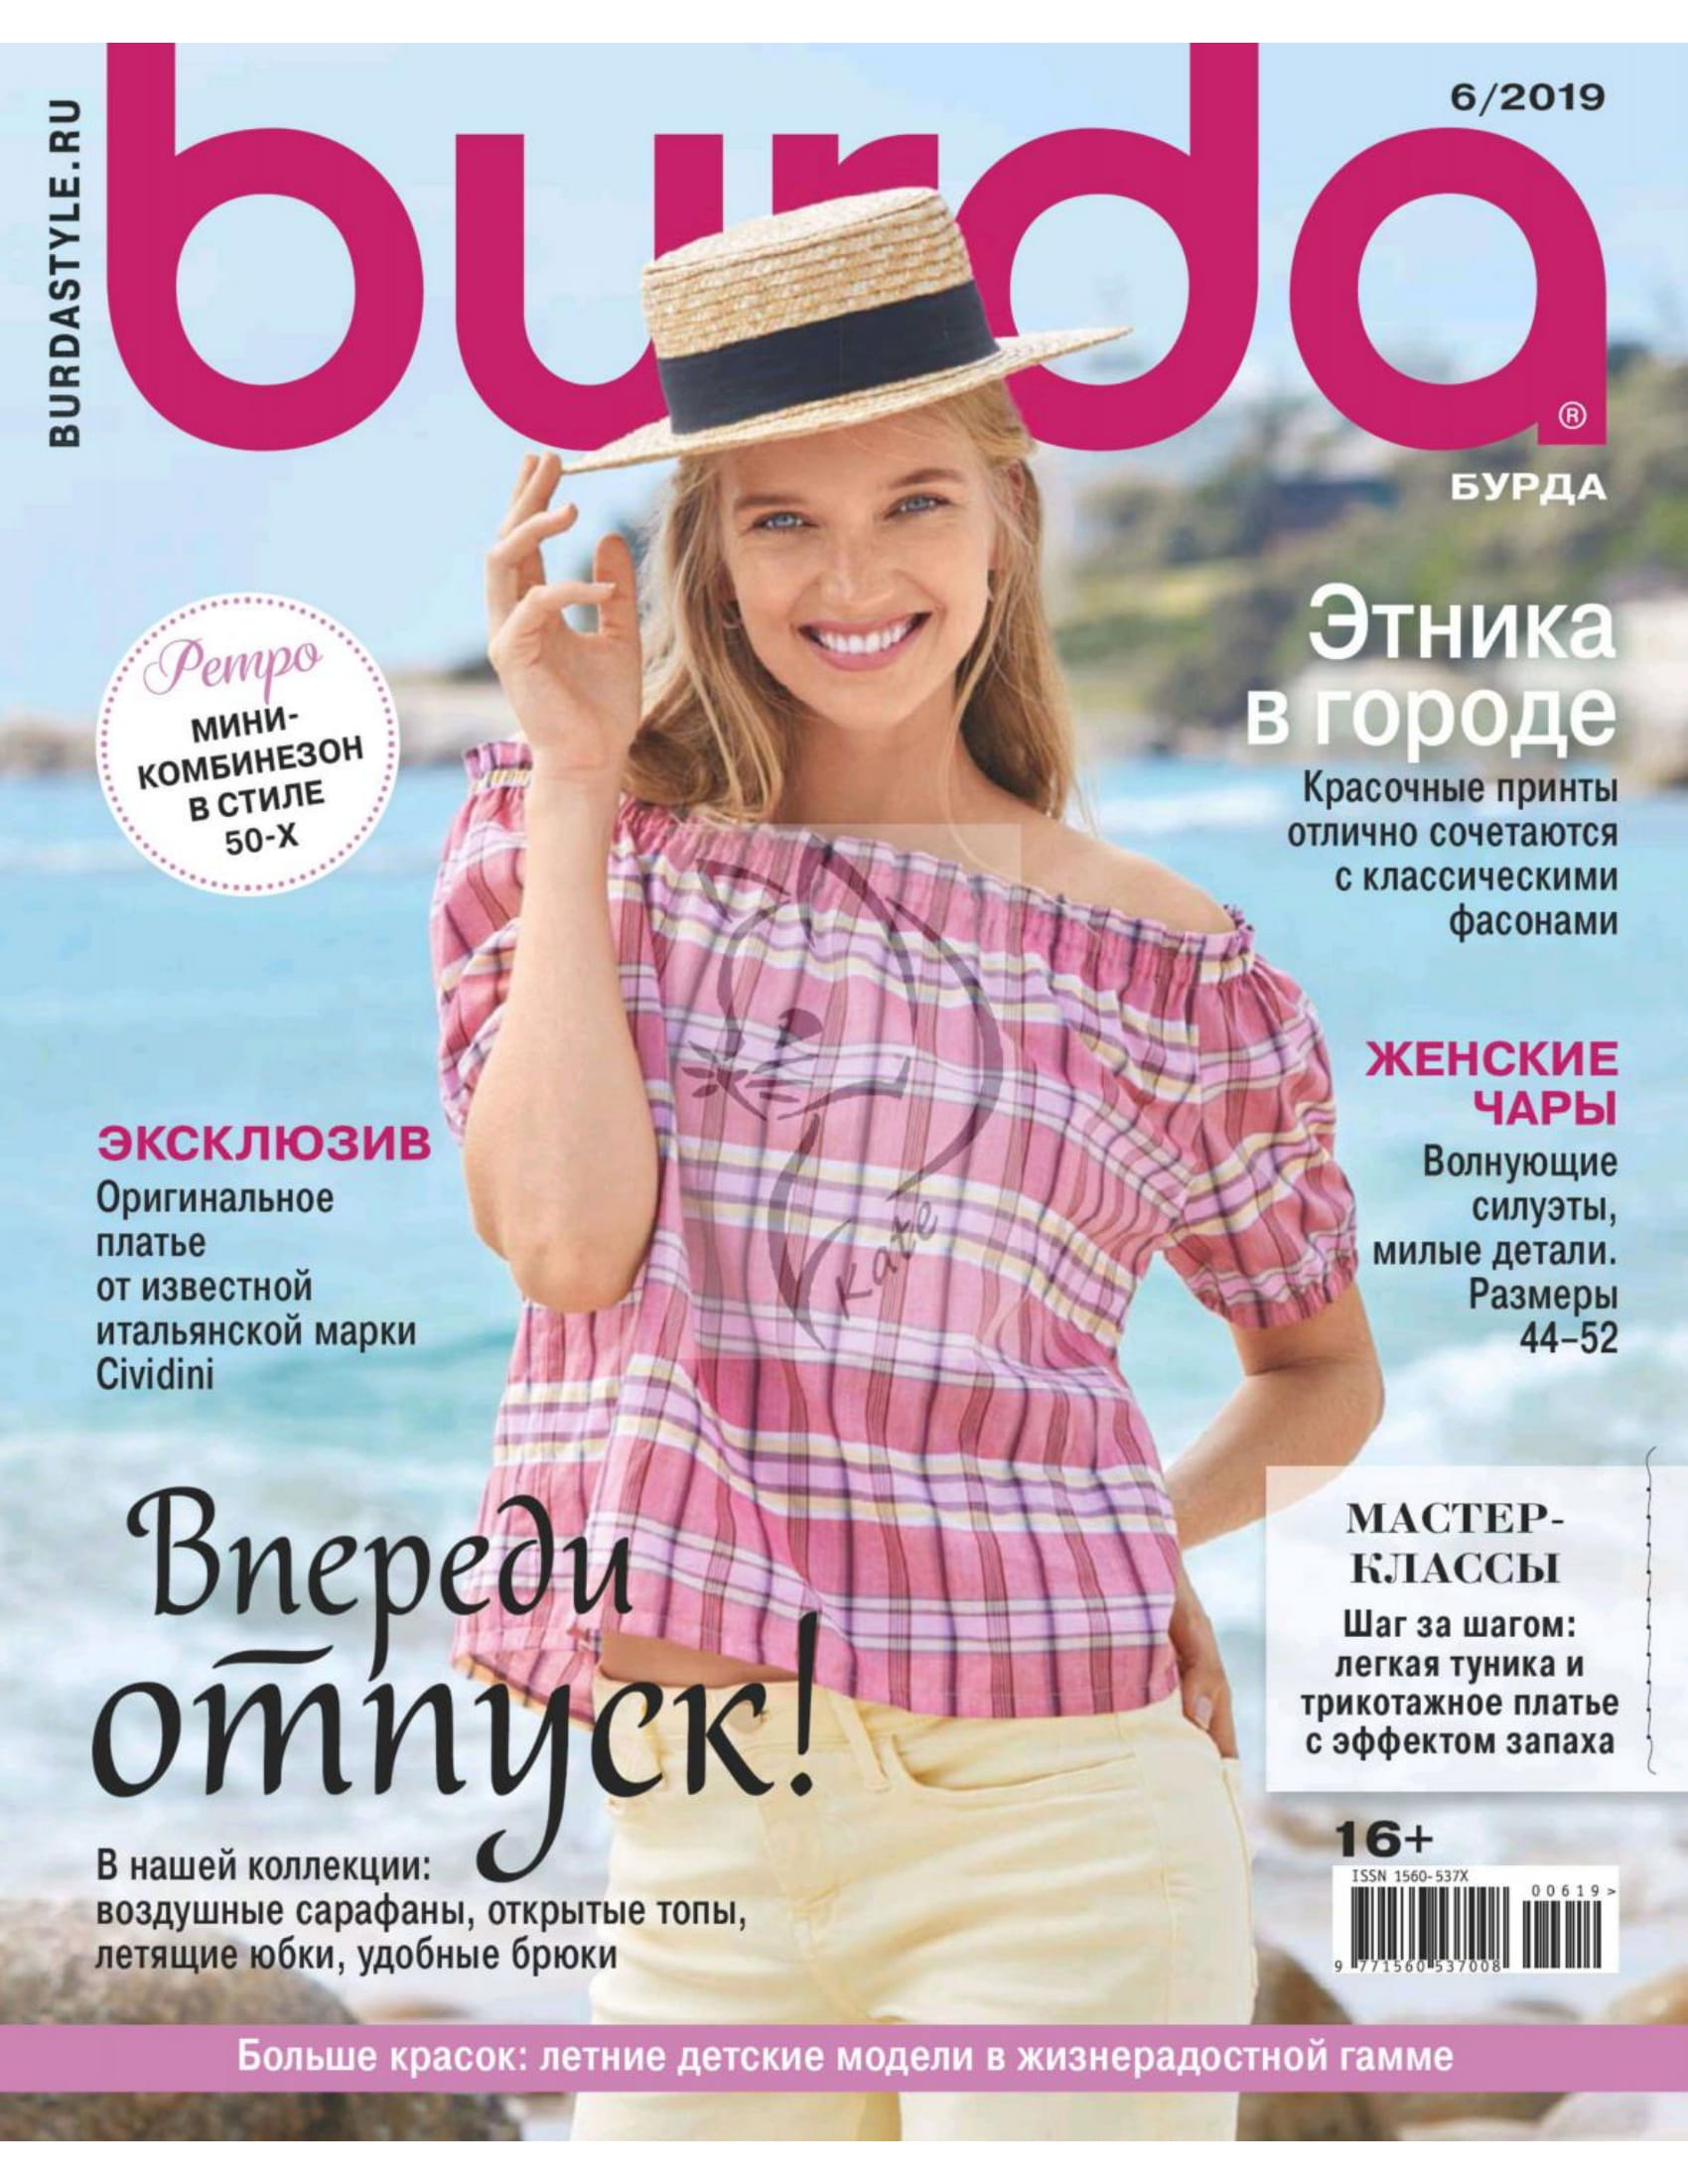 مجله بوردا با الگو